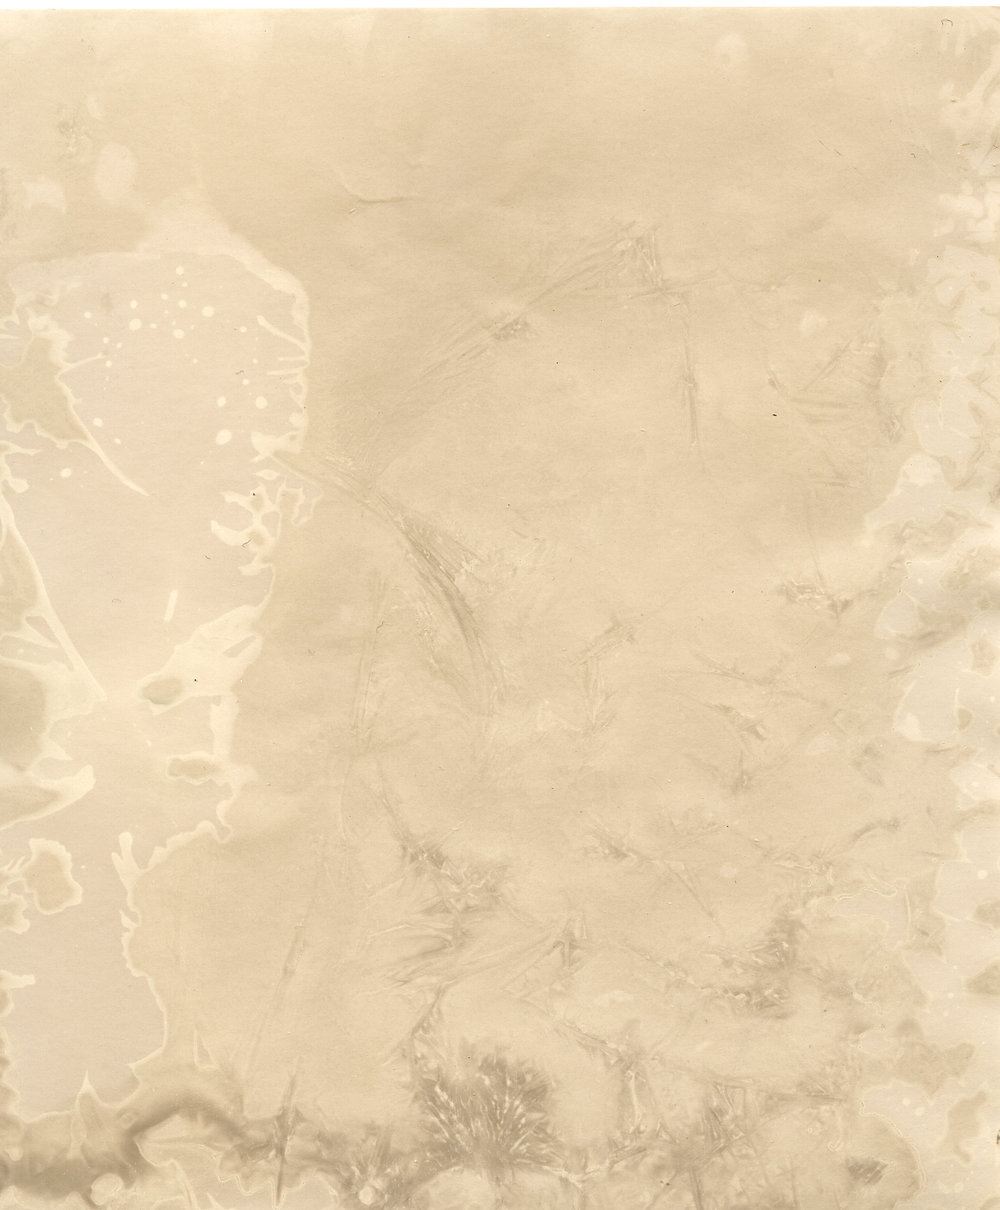 lumen-ice-7.jpg